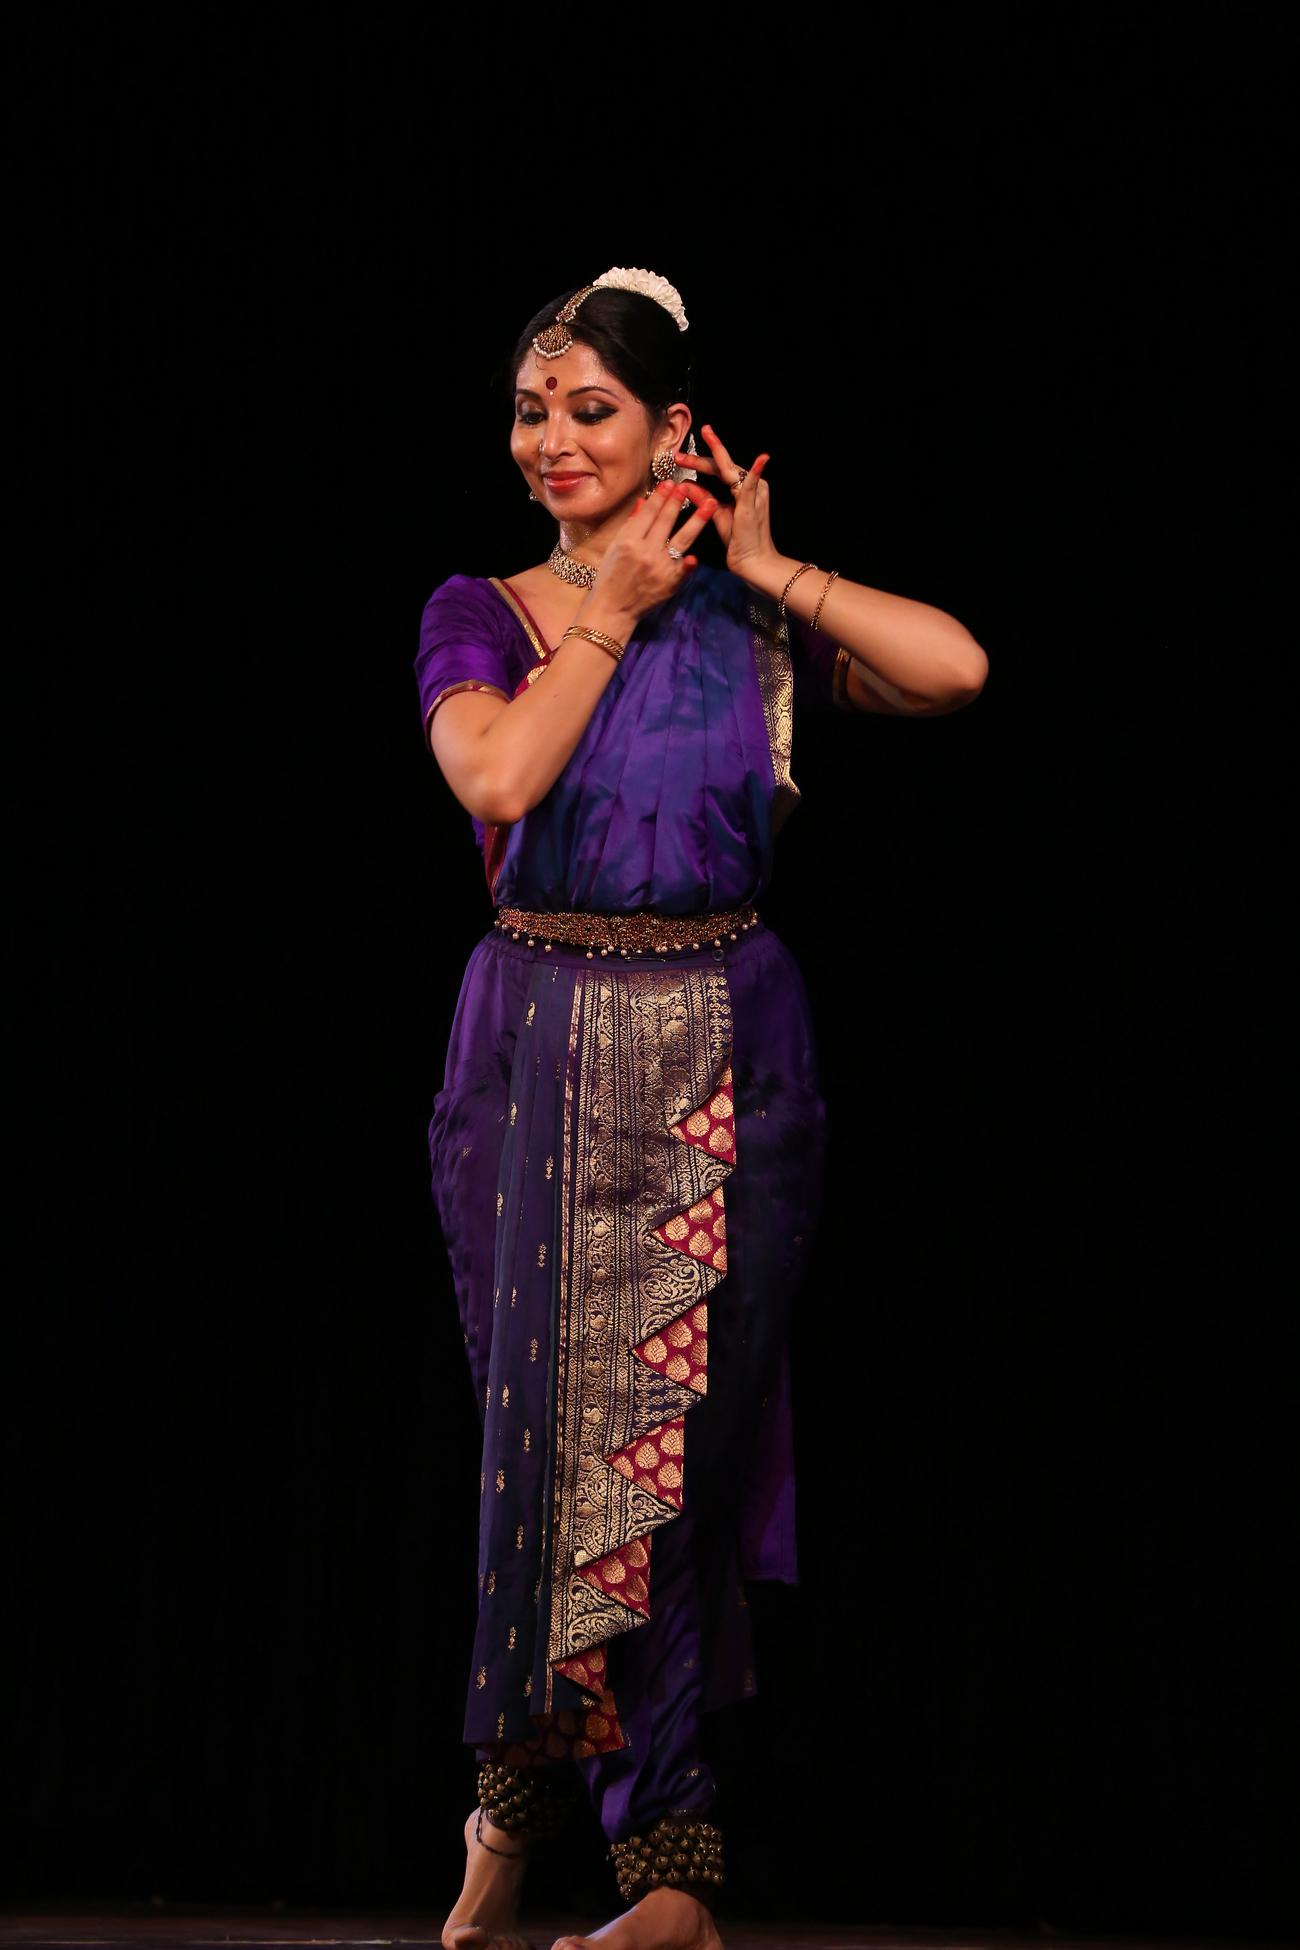 BWW Interview:  BHARATANATYAM expert Priya Venkataraman who performed in front of Barack Obama talks about the art form